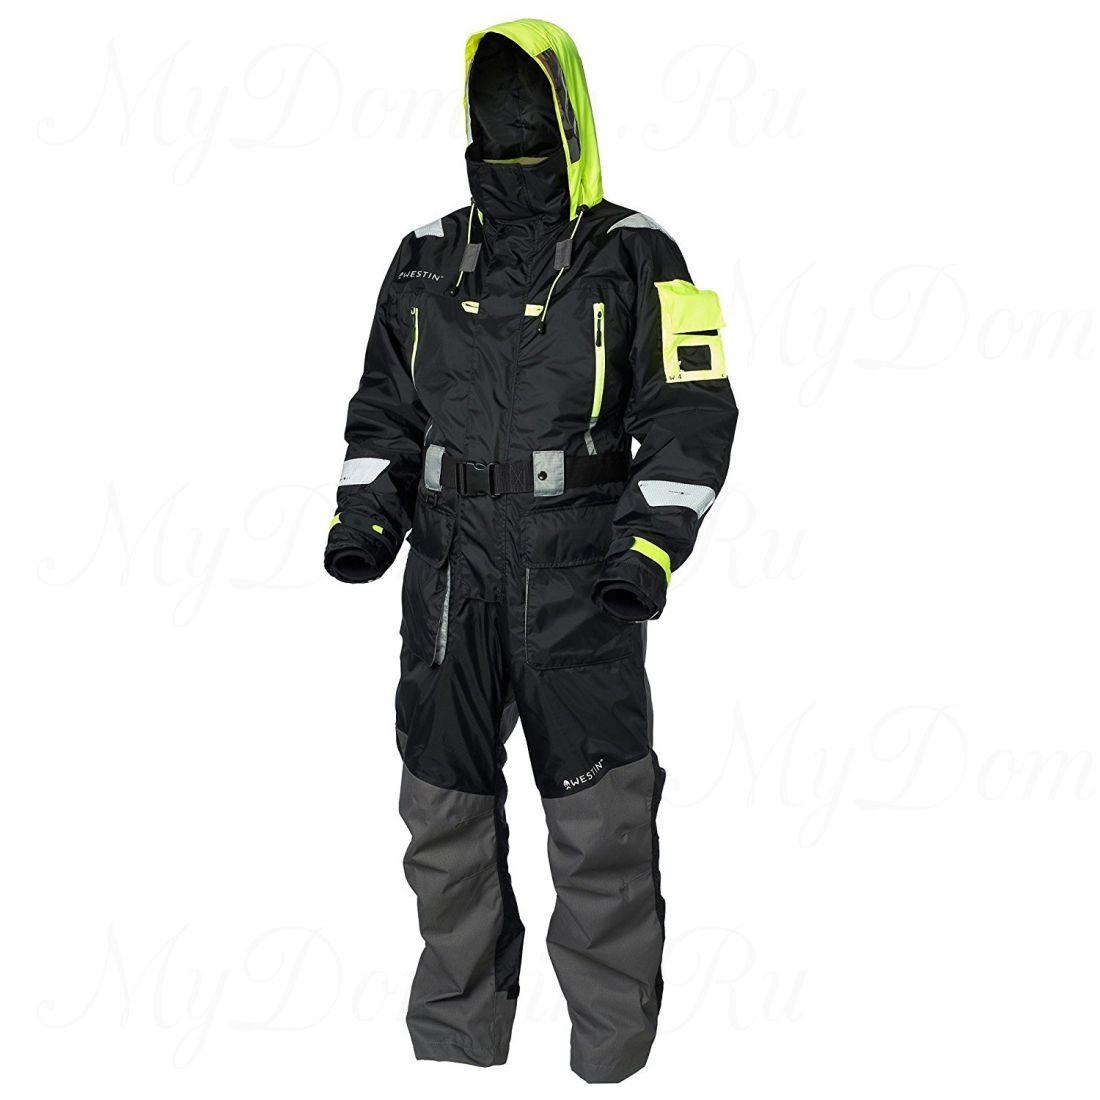 Костюм Westin W4 Flotation Suit Jetset Lime размер M